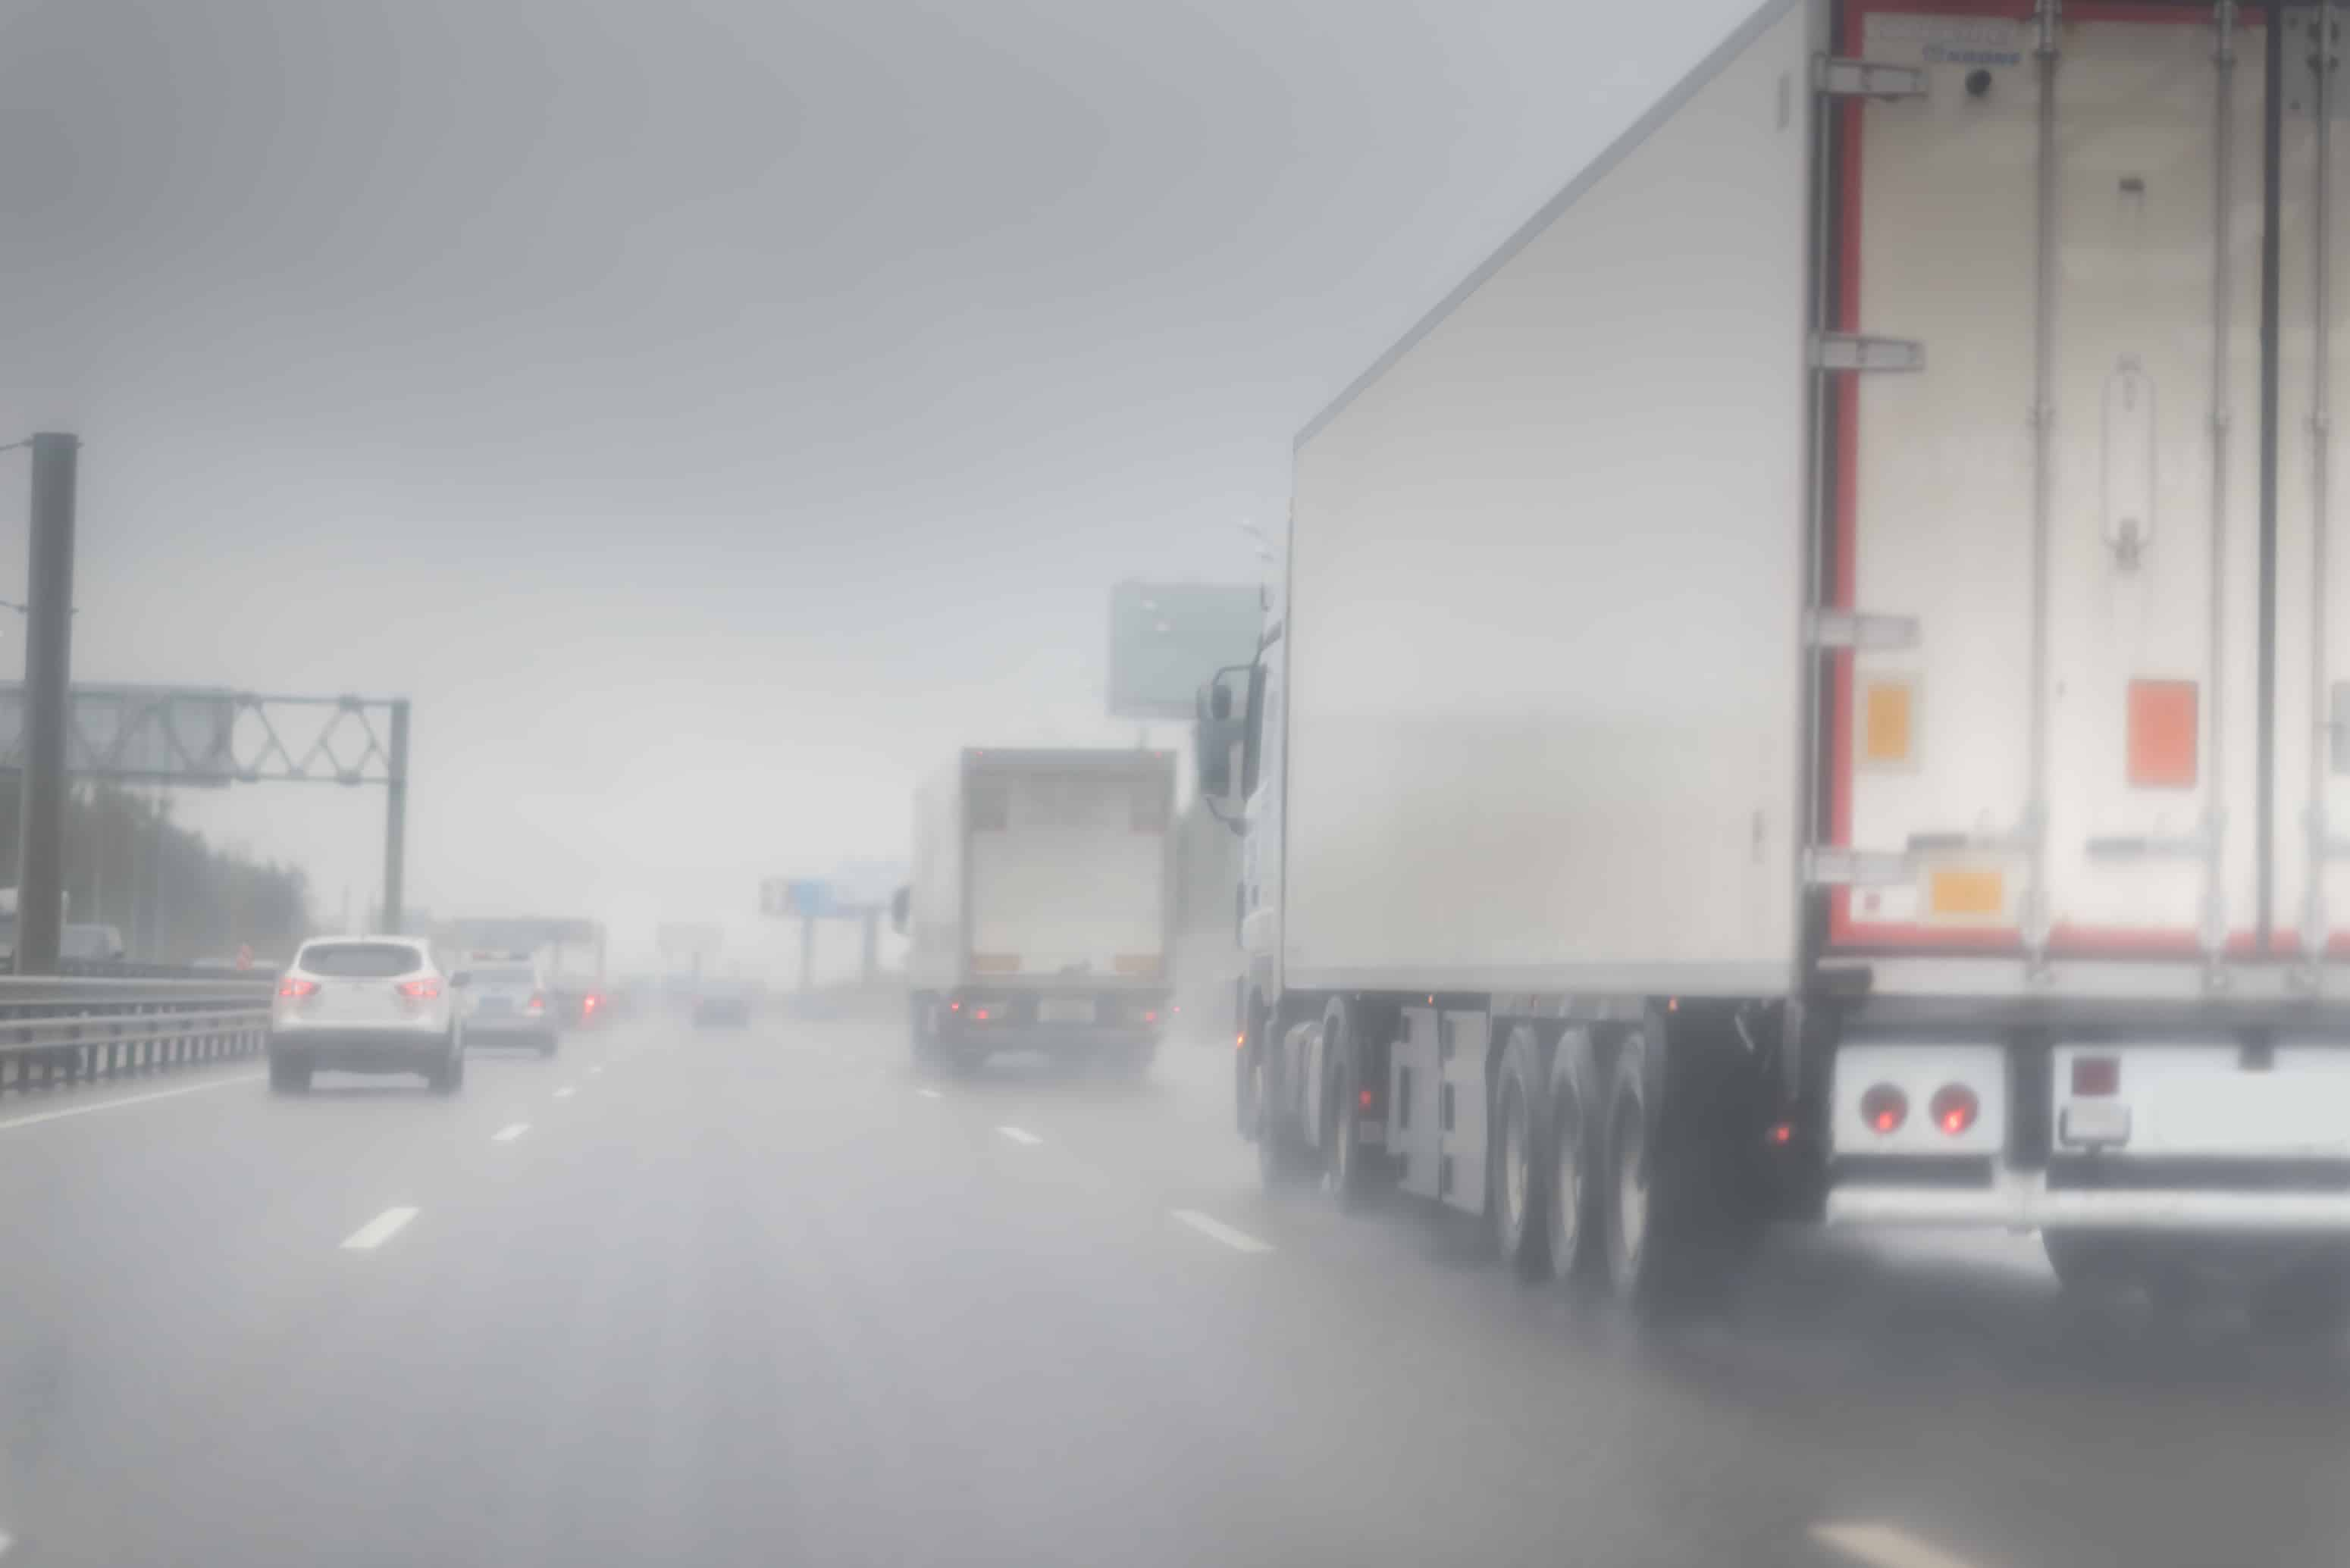 Man Seriously Injured in Semi-Truck Crash on Interstate 82 [Benton County, WA]